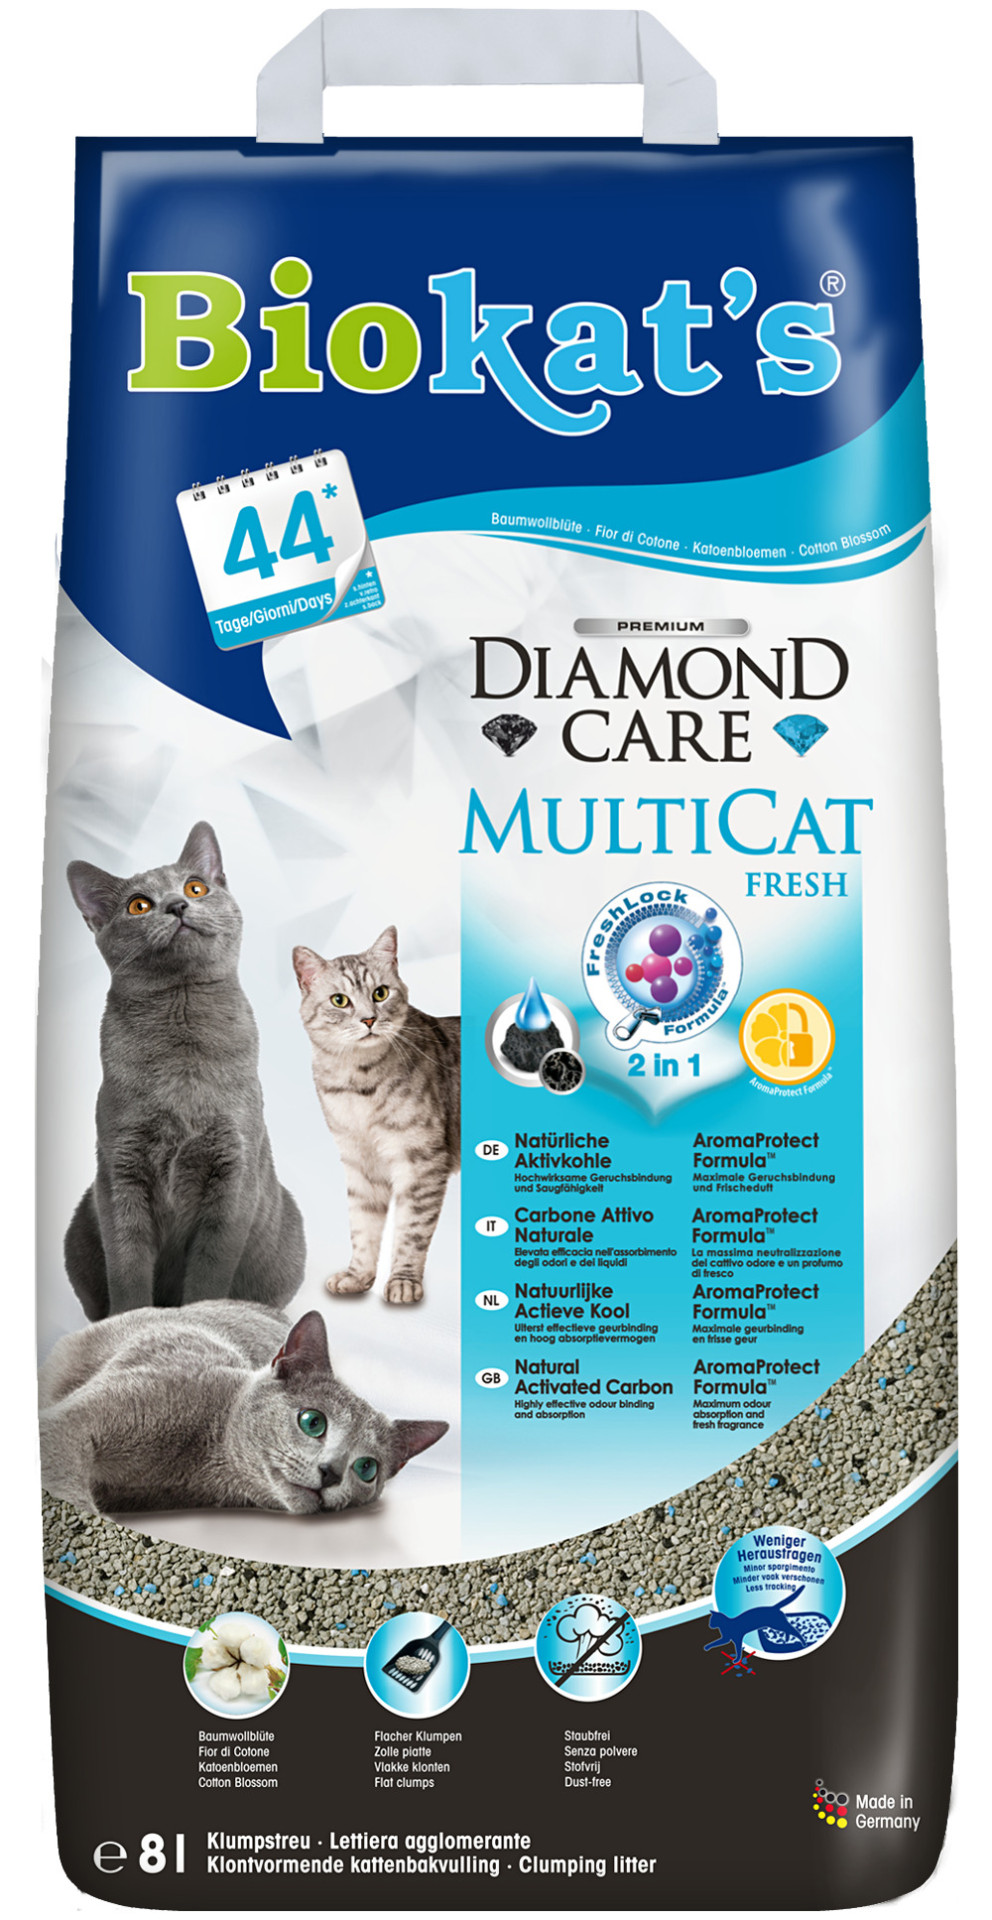 Biokat's Diamond Care MultiCat Fresh 8 ltr